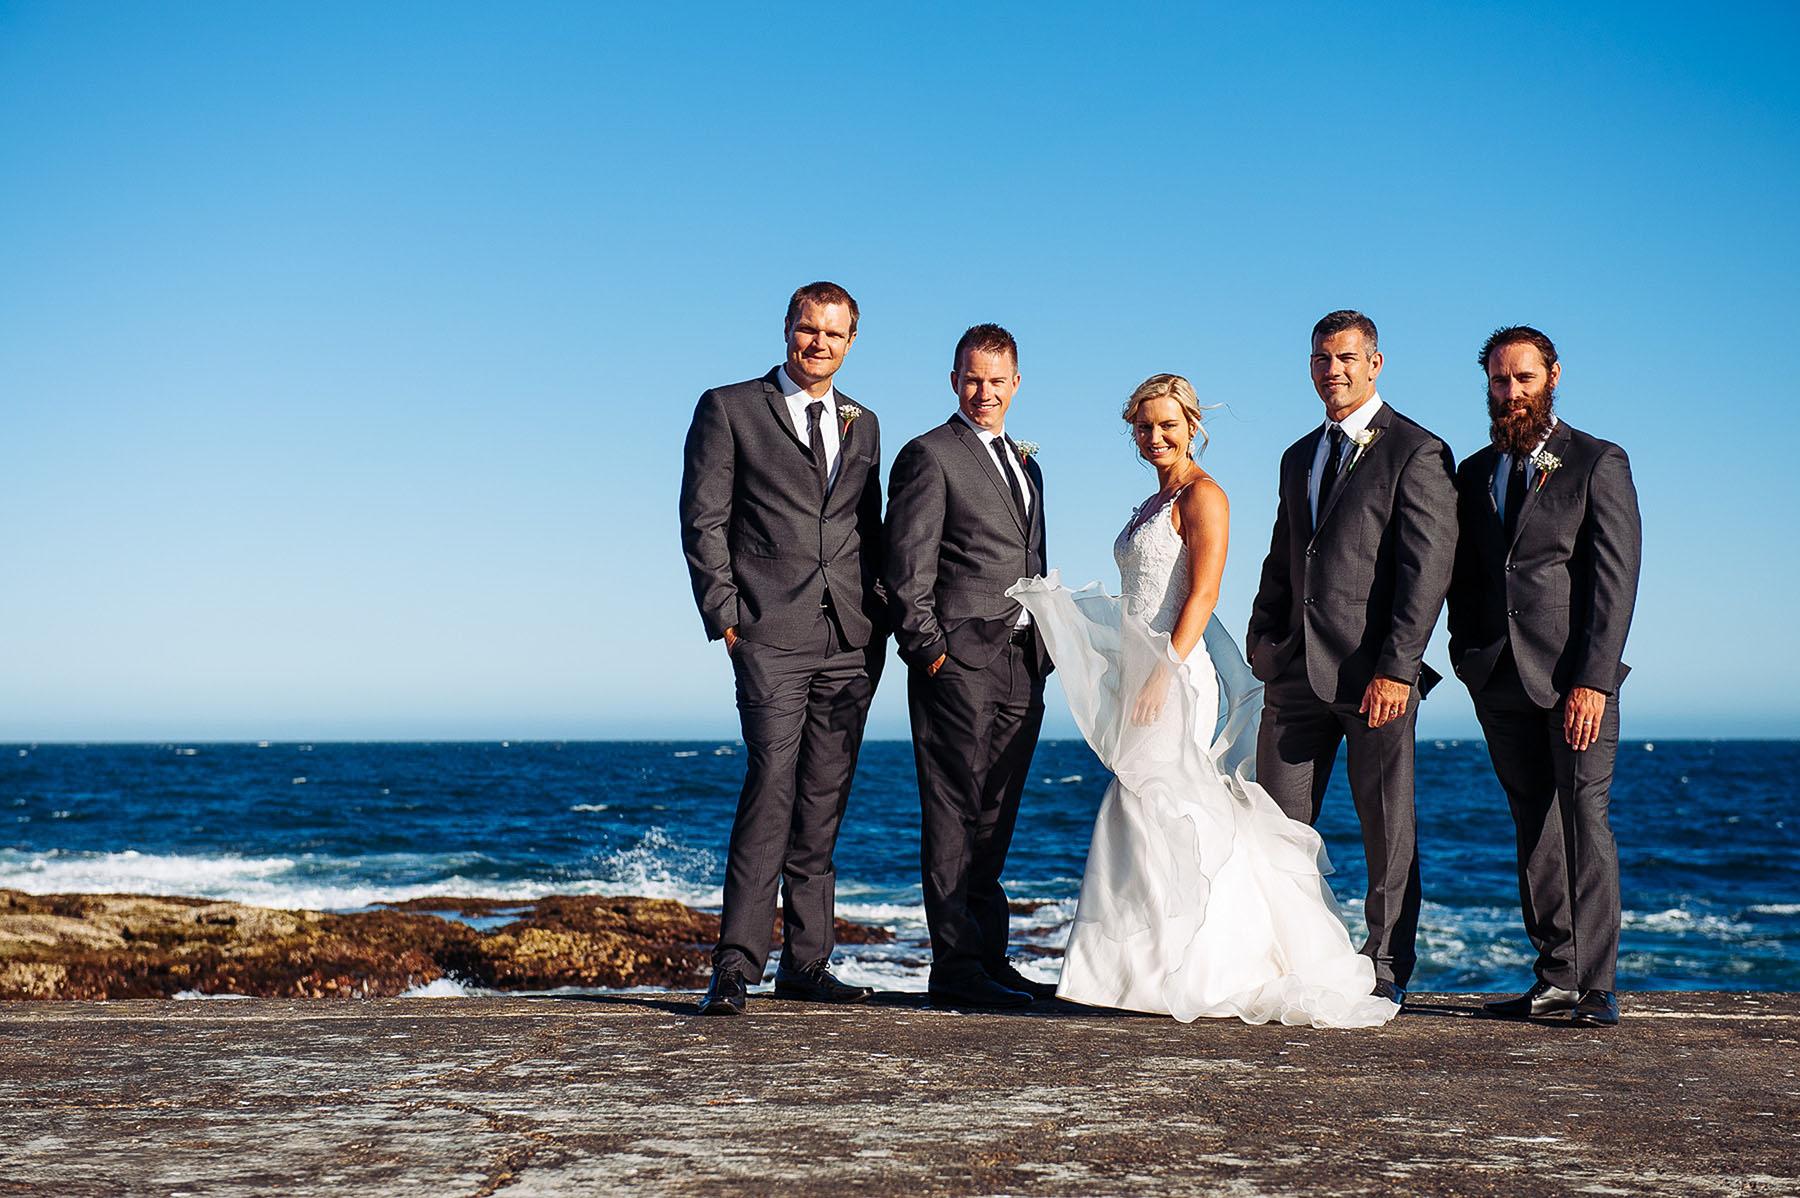 Marryme_wedding_photography_dorrigo_bellingen_photographer_36.jpg